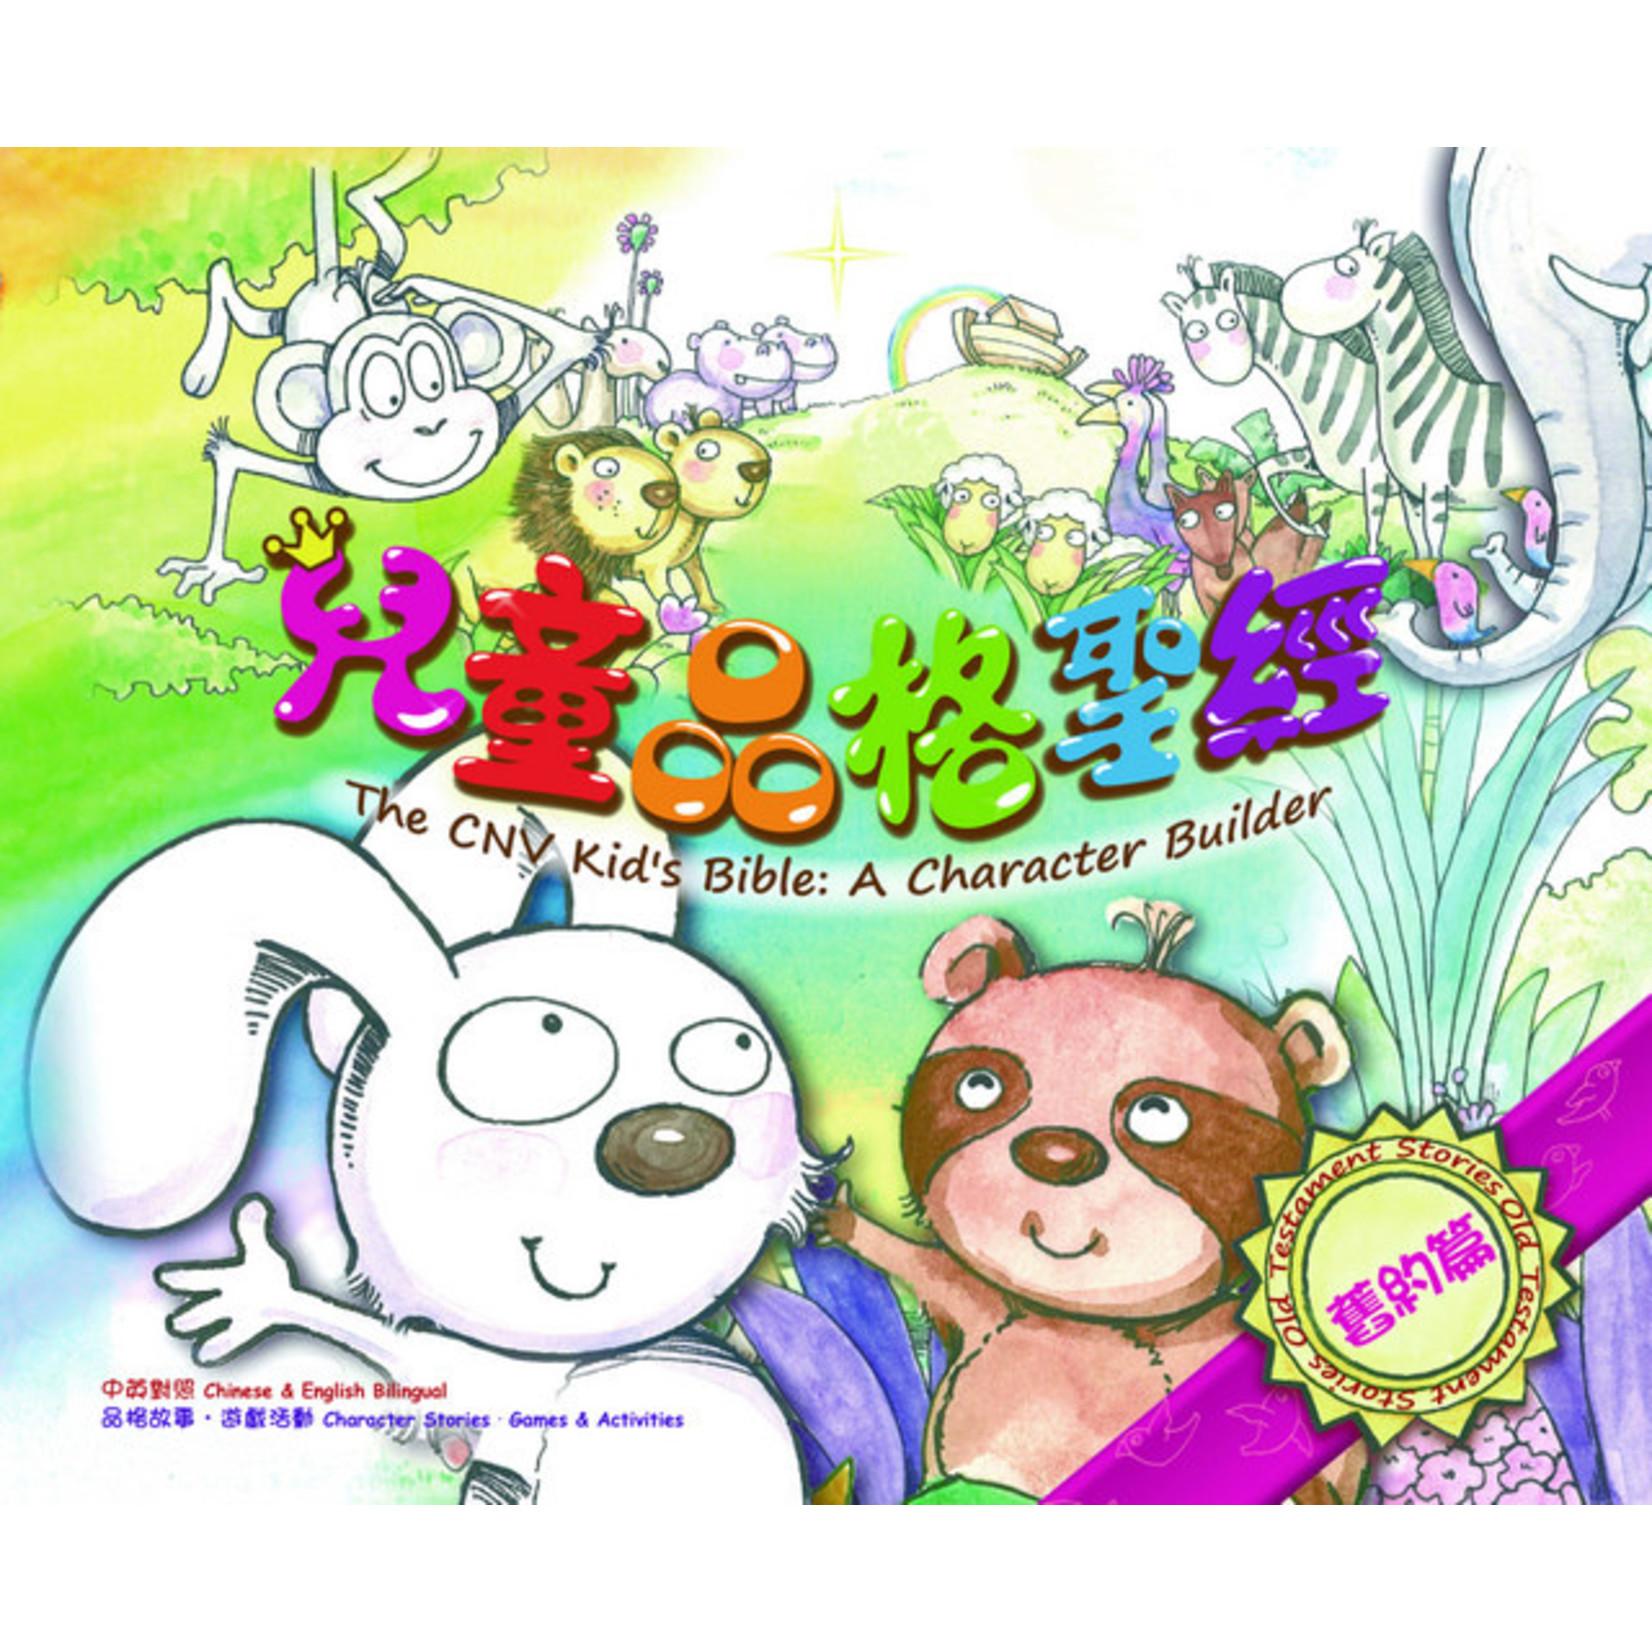 環球聖經公會 The Worldwide Bible Society 兒童品格聖經(舊約篇)(中英對照)(繁體) The CNV Kid's Bible: A Character Builder (Old Testament) (Trad. Chinese)